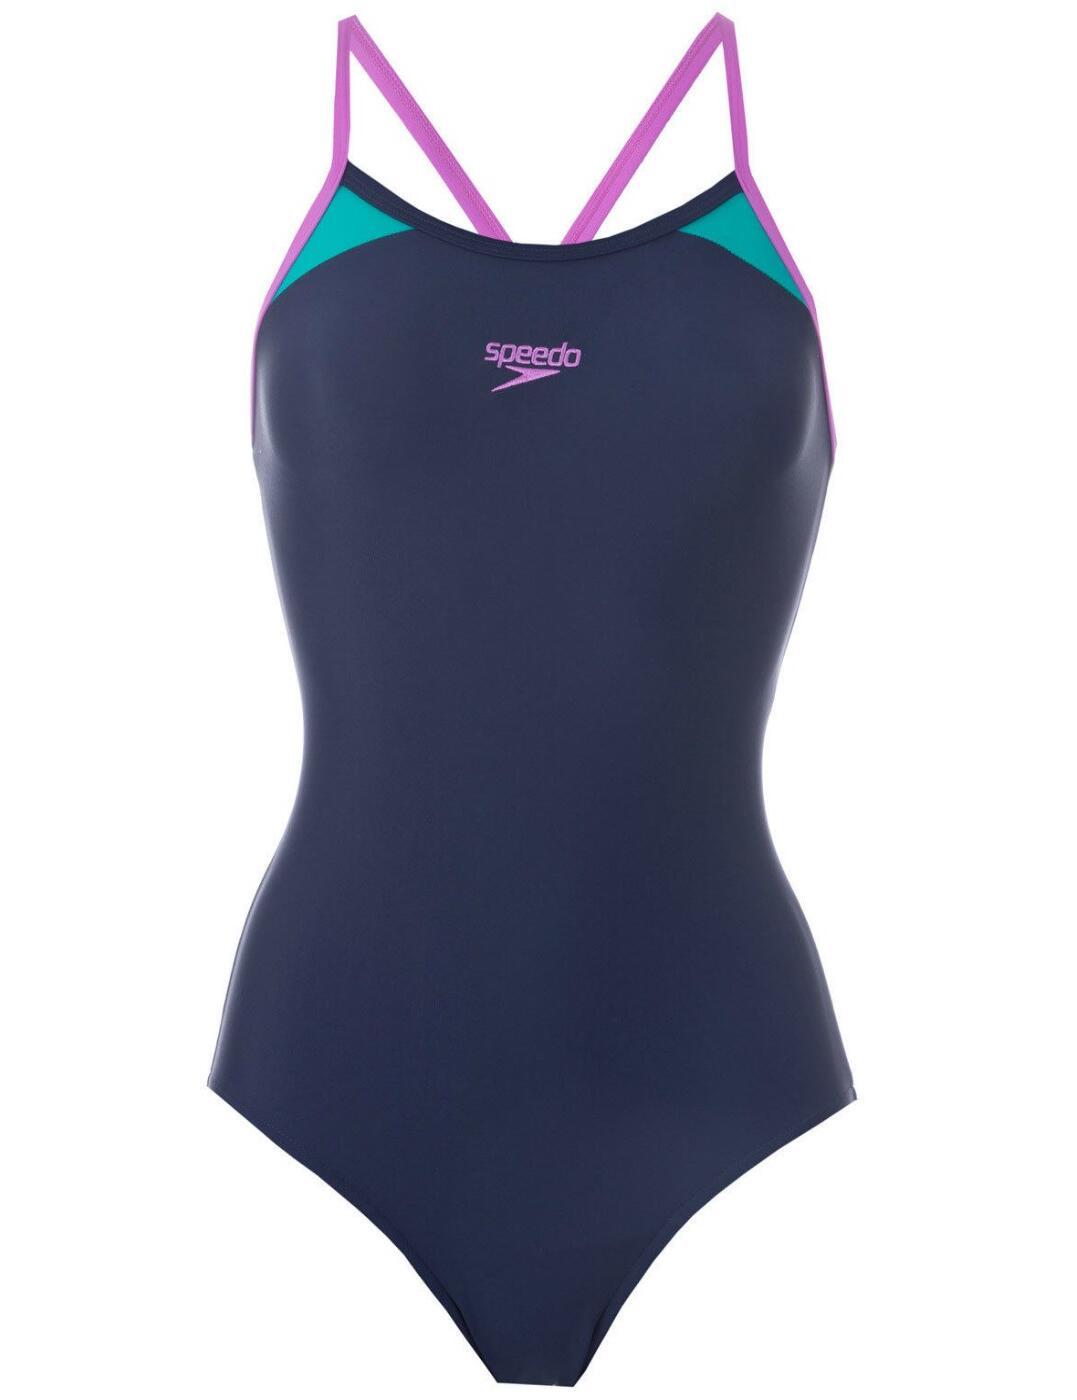 810837B373 Speedo Splice Thinstrap Racerback Swimsuit - 810837B373 Navy/Purple